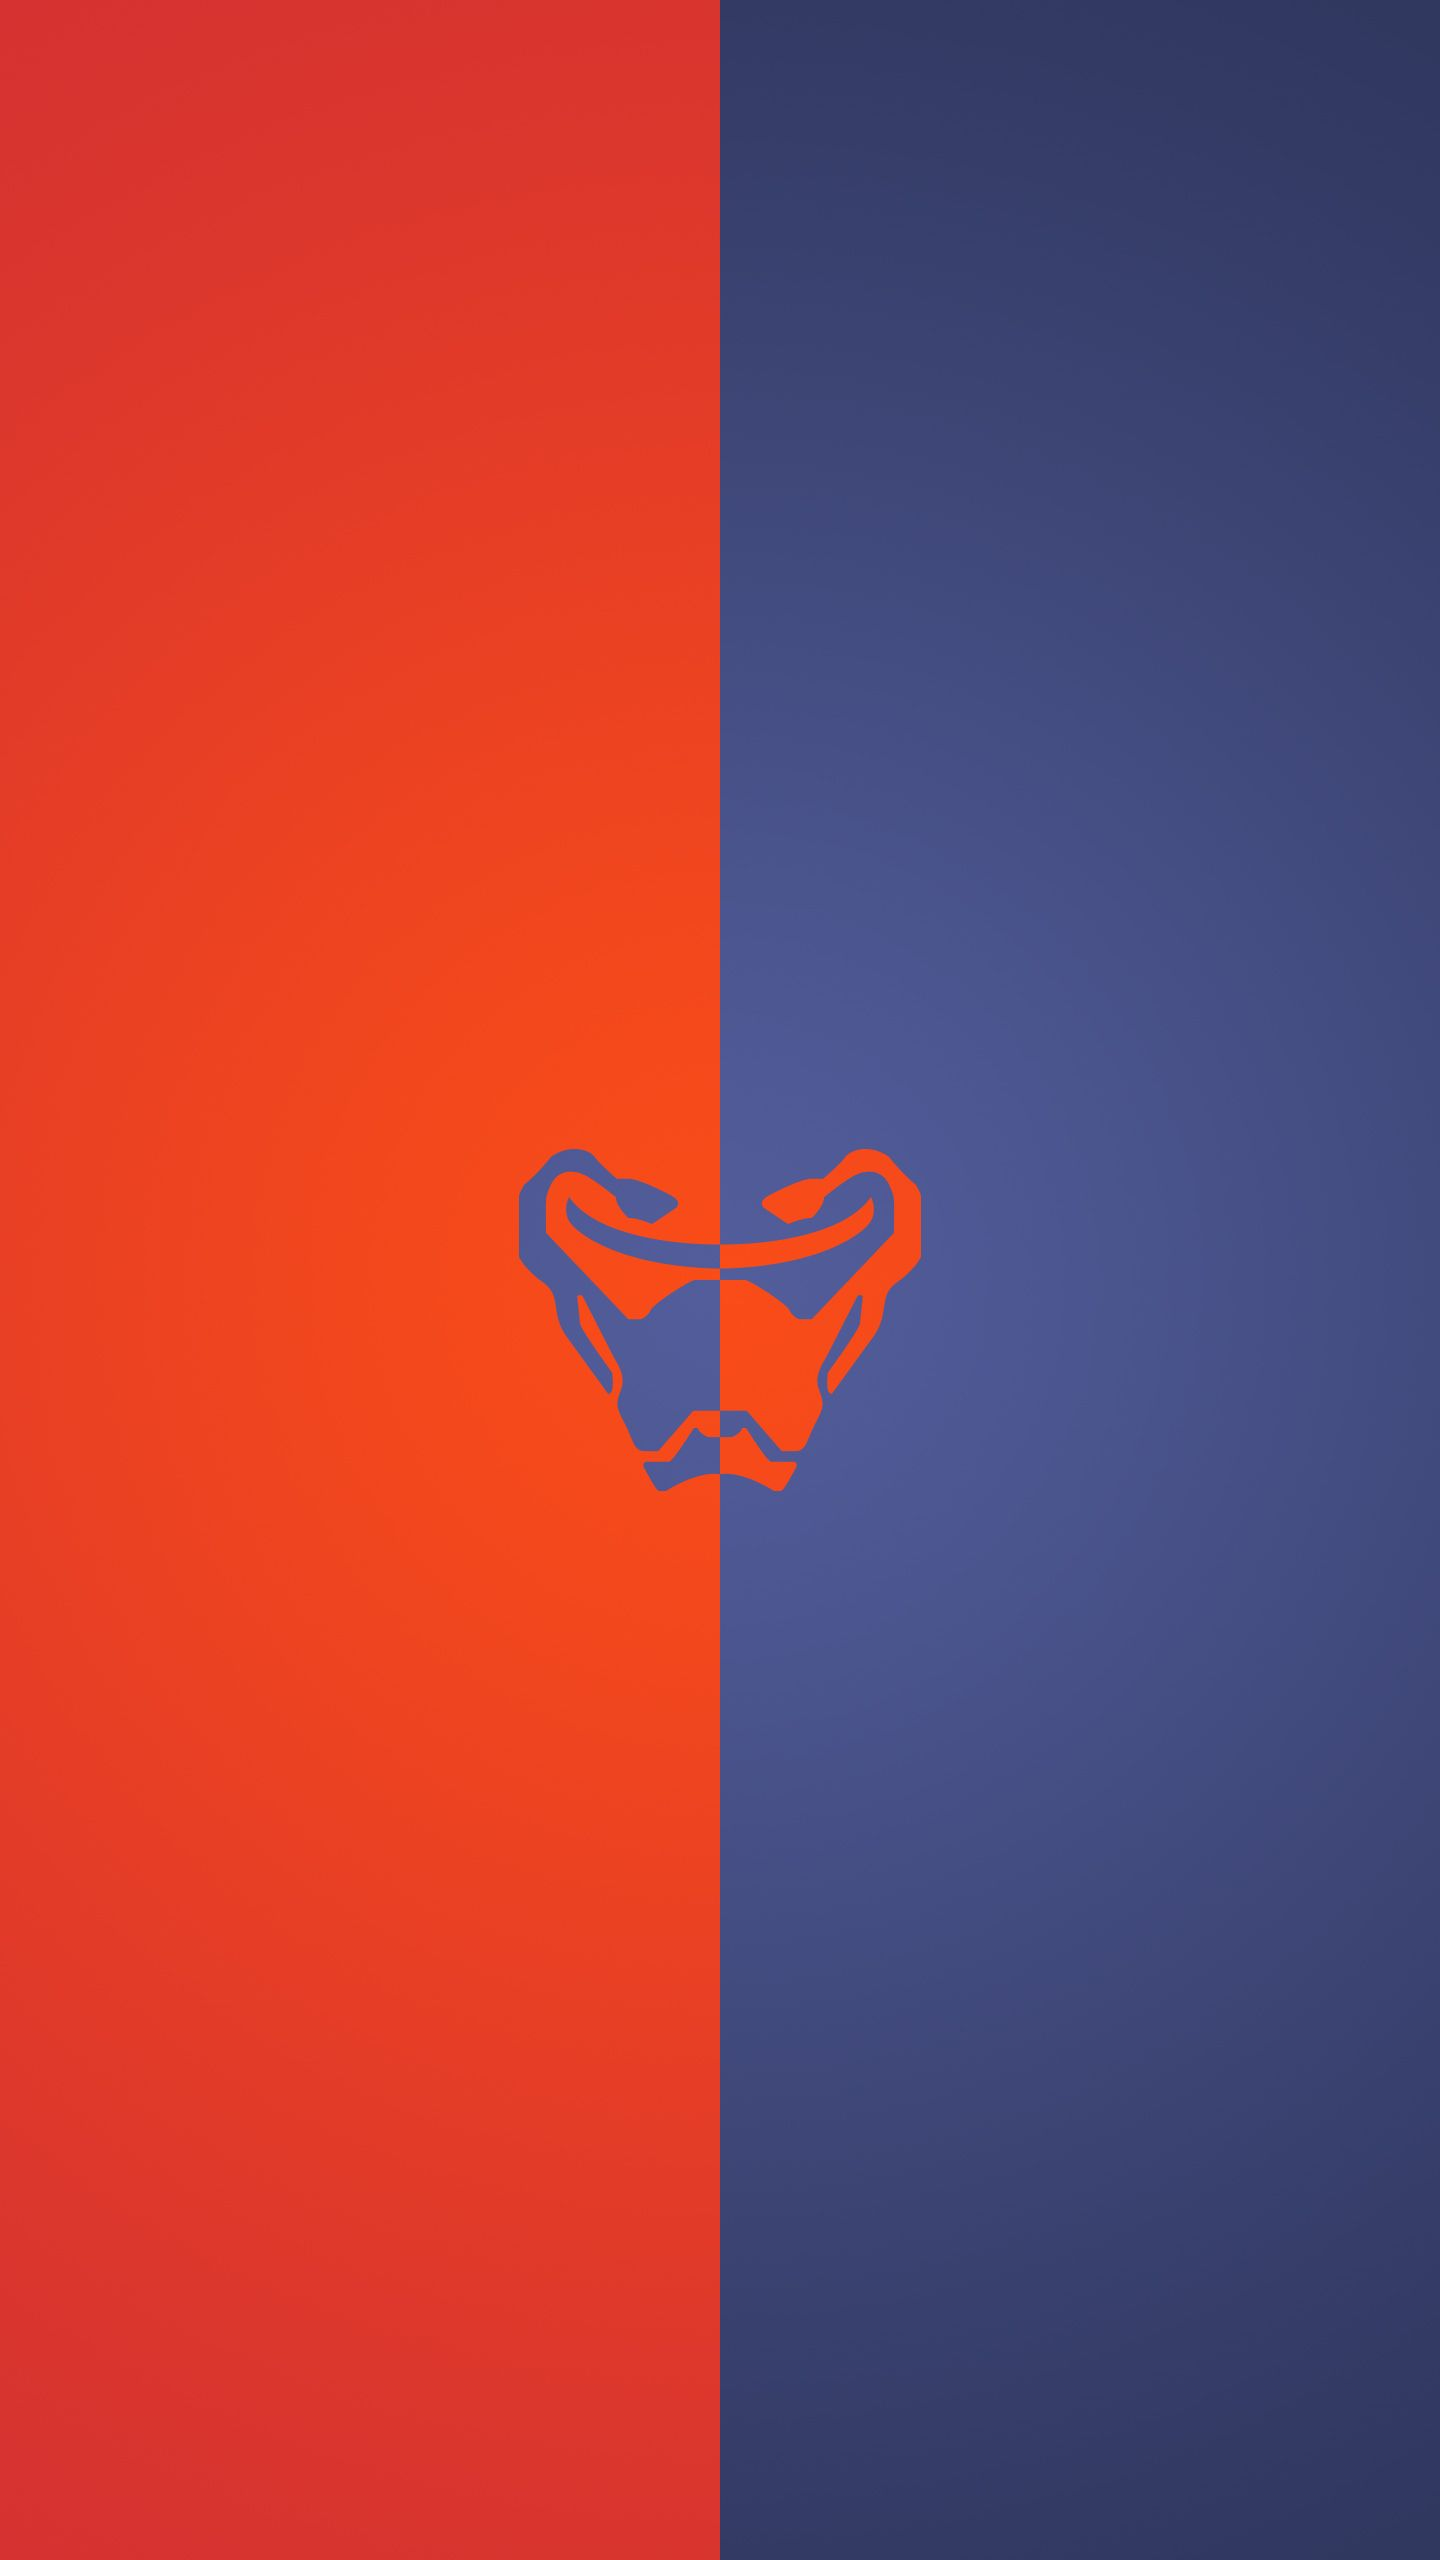 Overwatch - Soldier:76 Wallpaper for V20 | Overwatch | Jogos